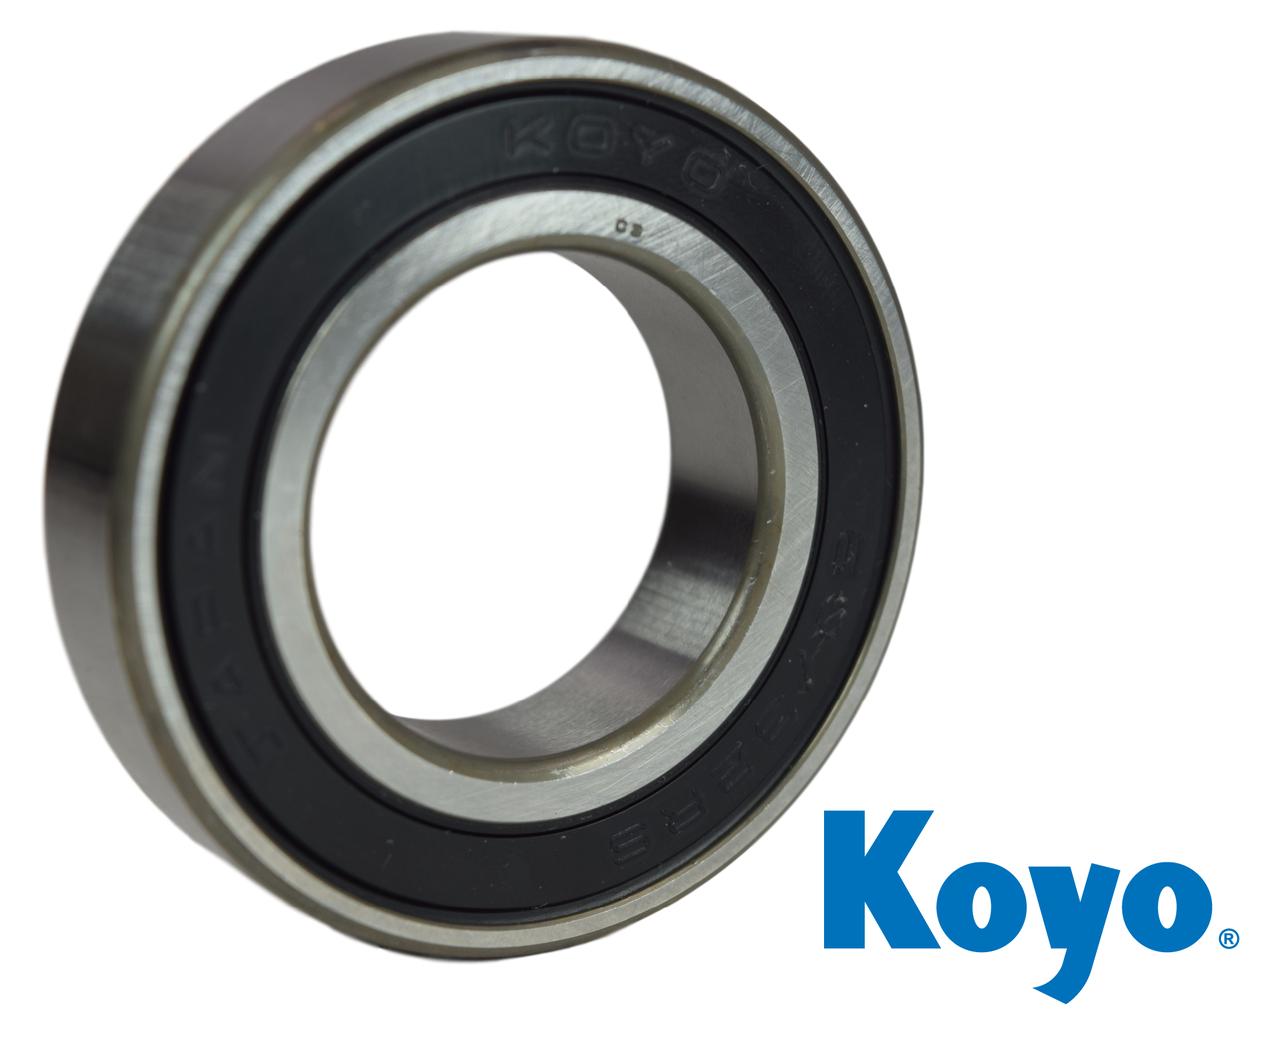 Koyo 60/32-2RSC3 Radial Ball Bearing 32X58X13 Image